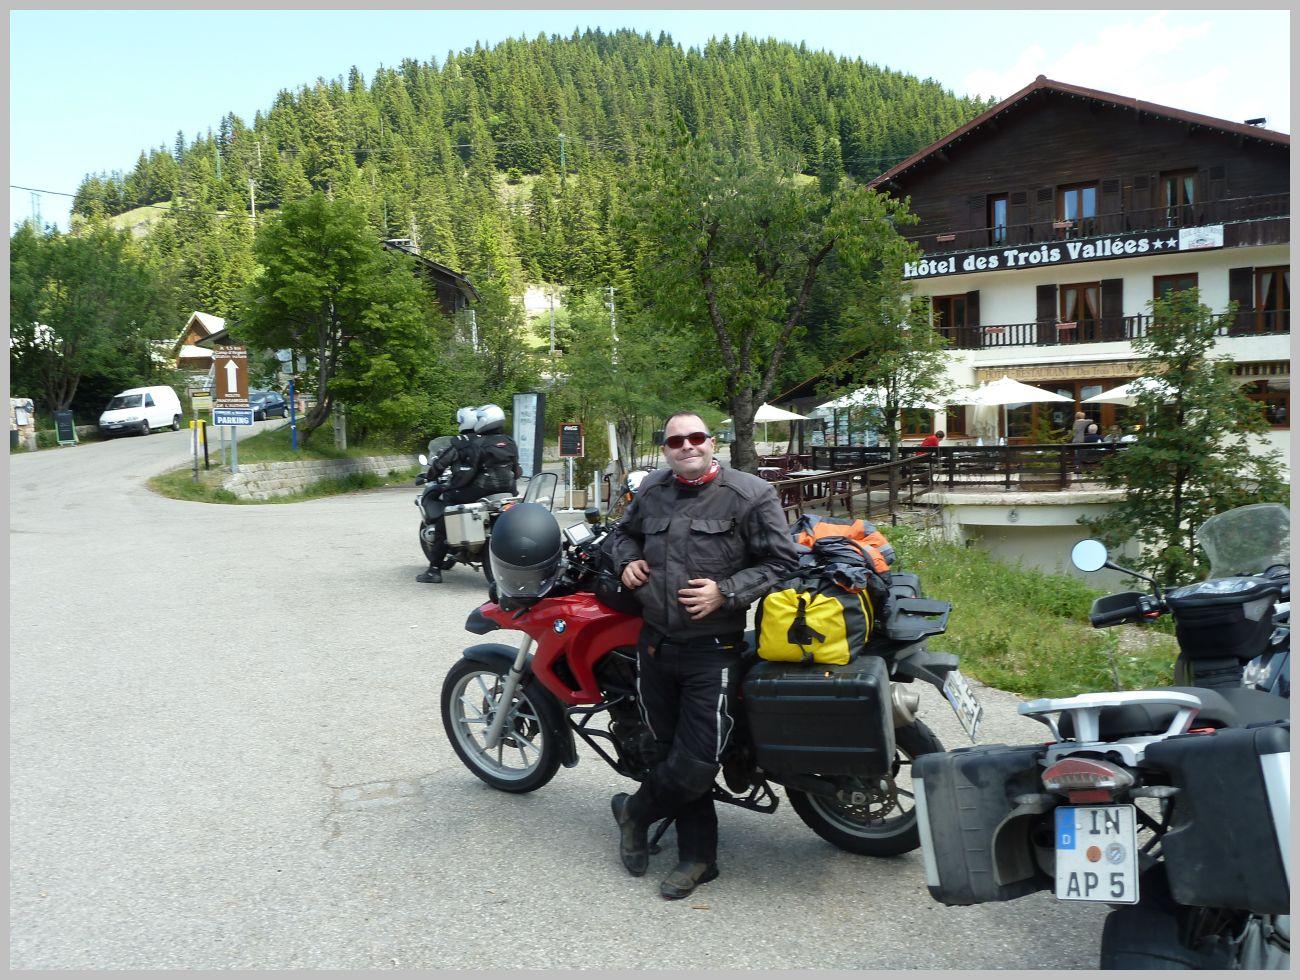 201206_Korsika_Moped069